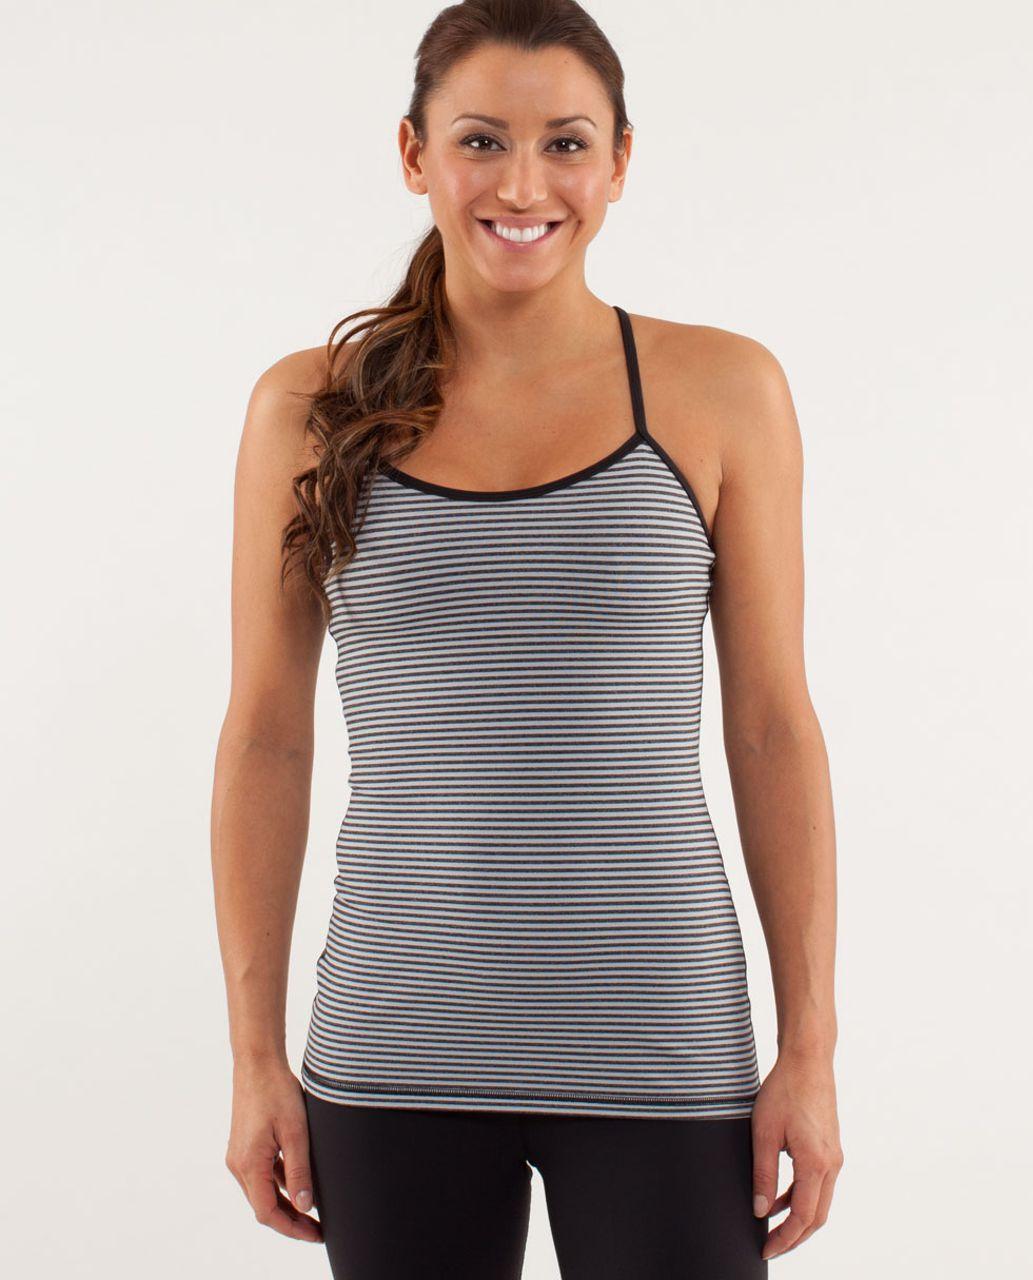 Lululemon Power Y Tank *Luon Light - Slope Stripe Silver Slate Heathered Black / Black